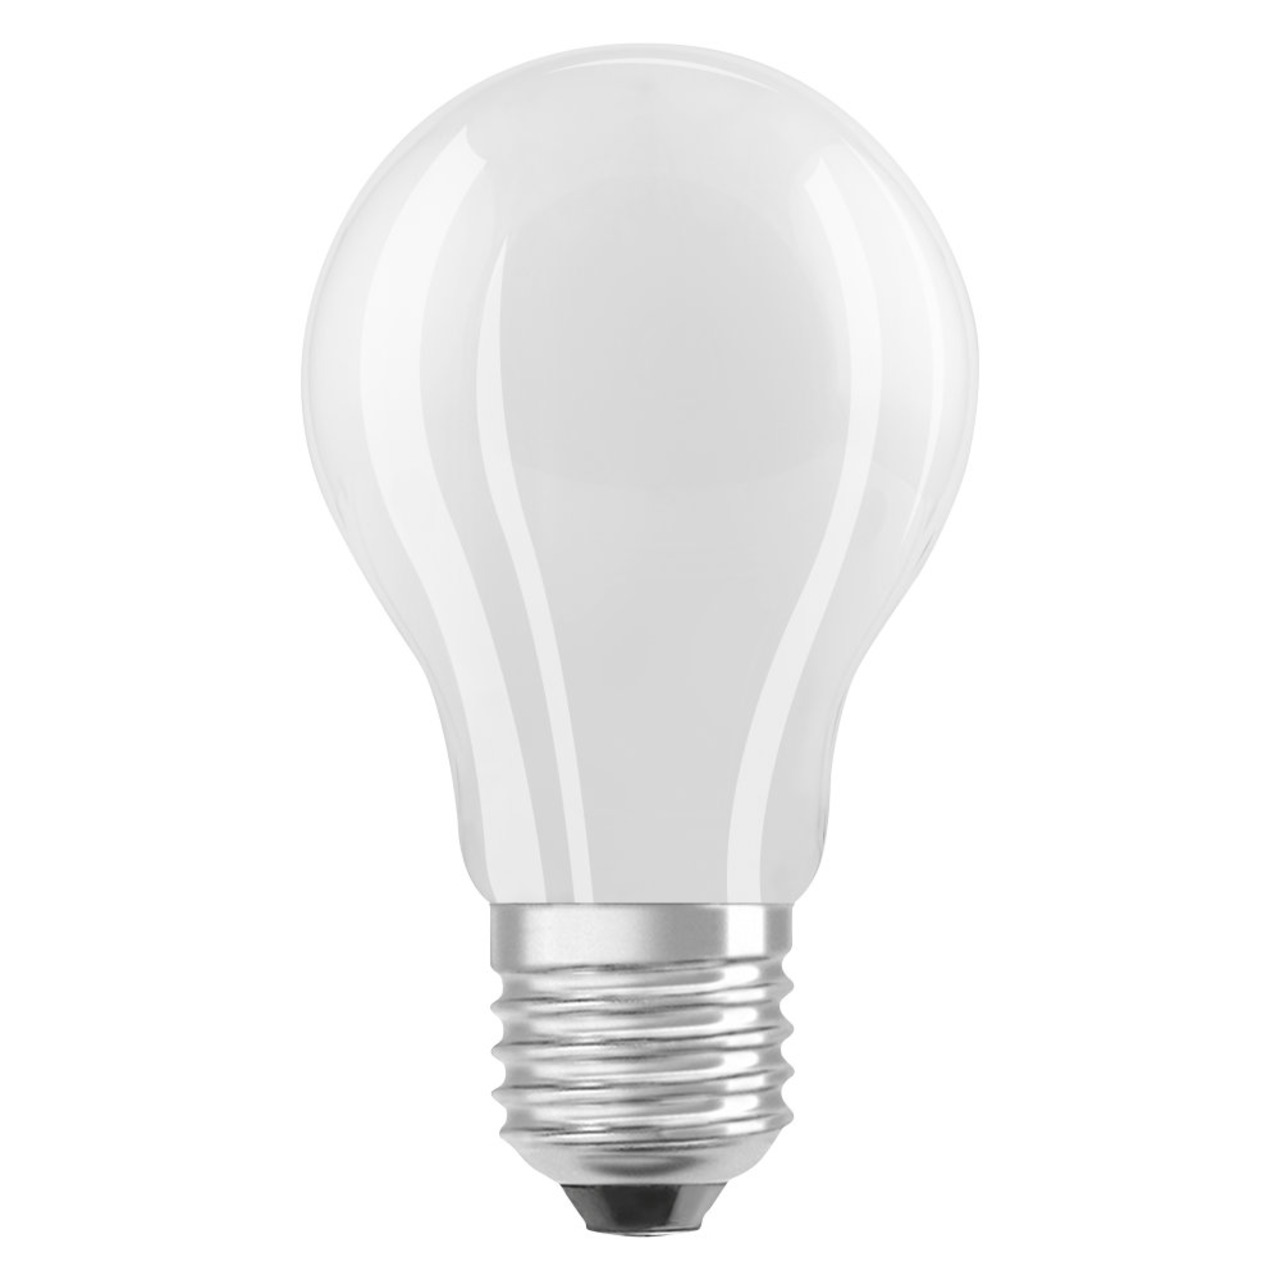 OSRAM LED Superstar 12-W-Filament-LED-Lampe E27- warmweiss- matt- dimmbar- 1521 lm